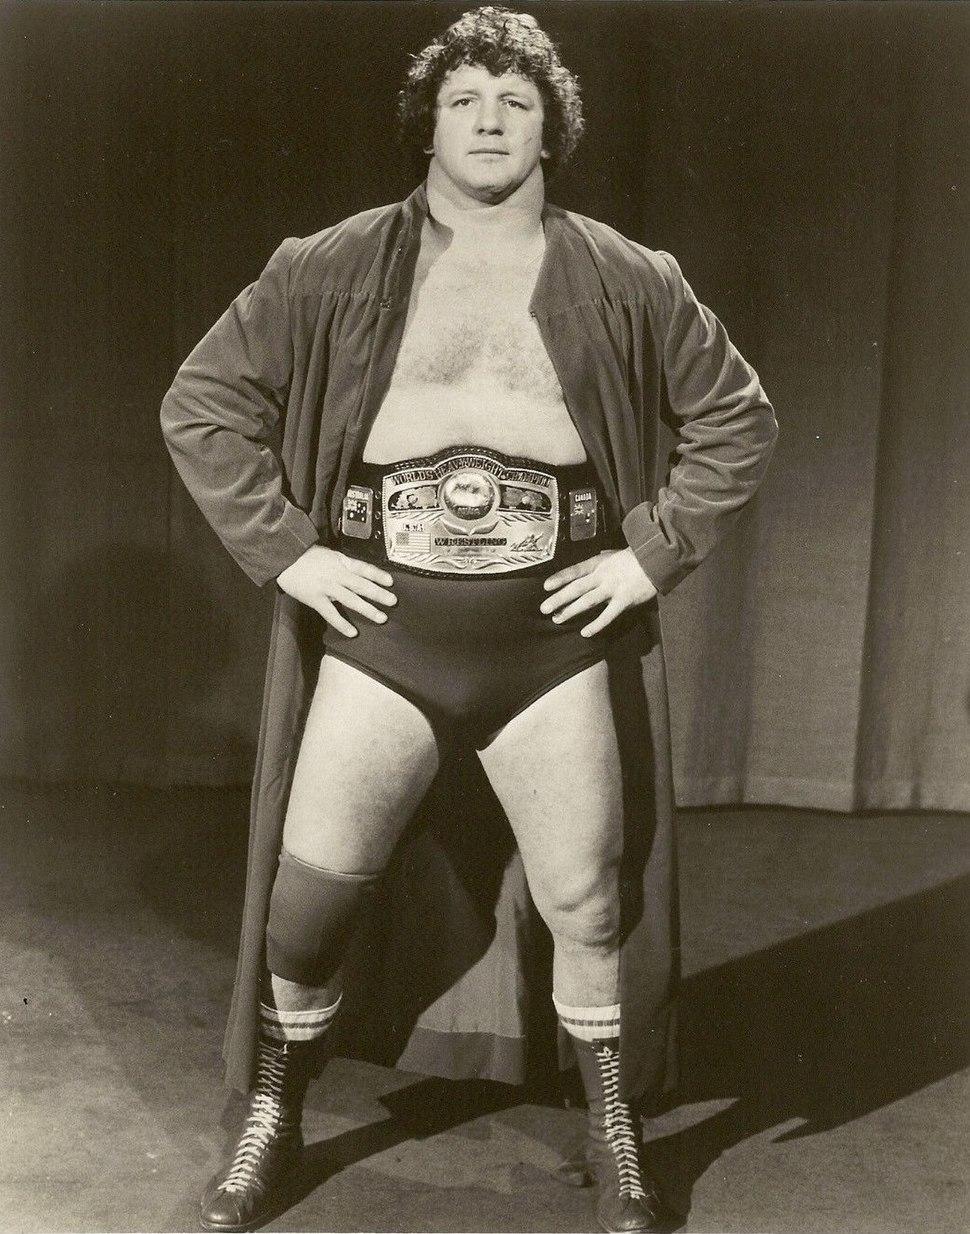 Terry Funk NWA Champion